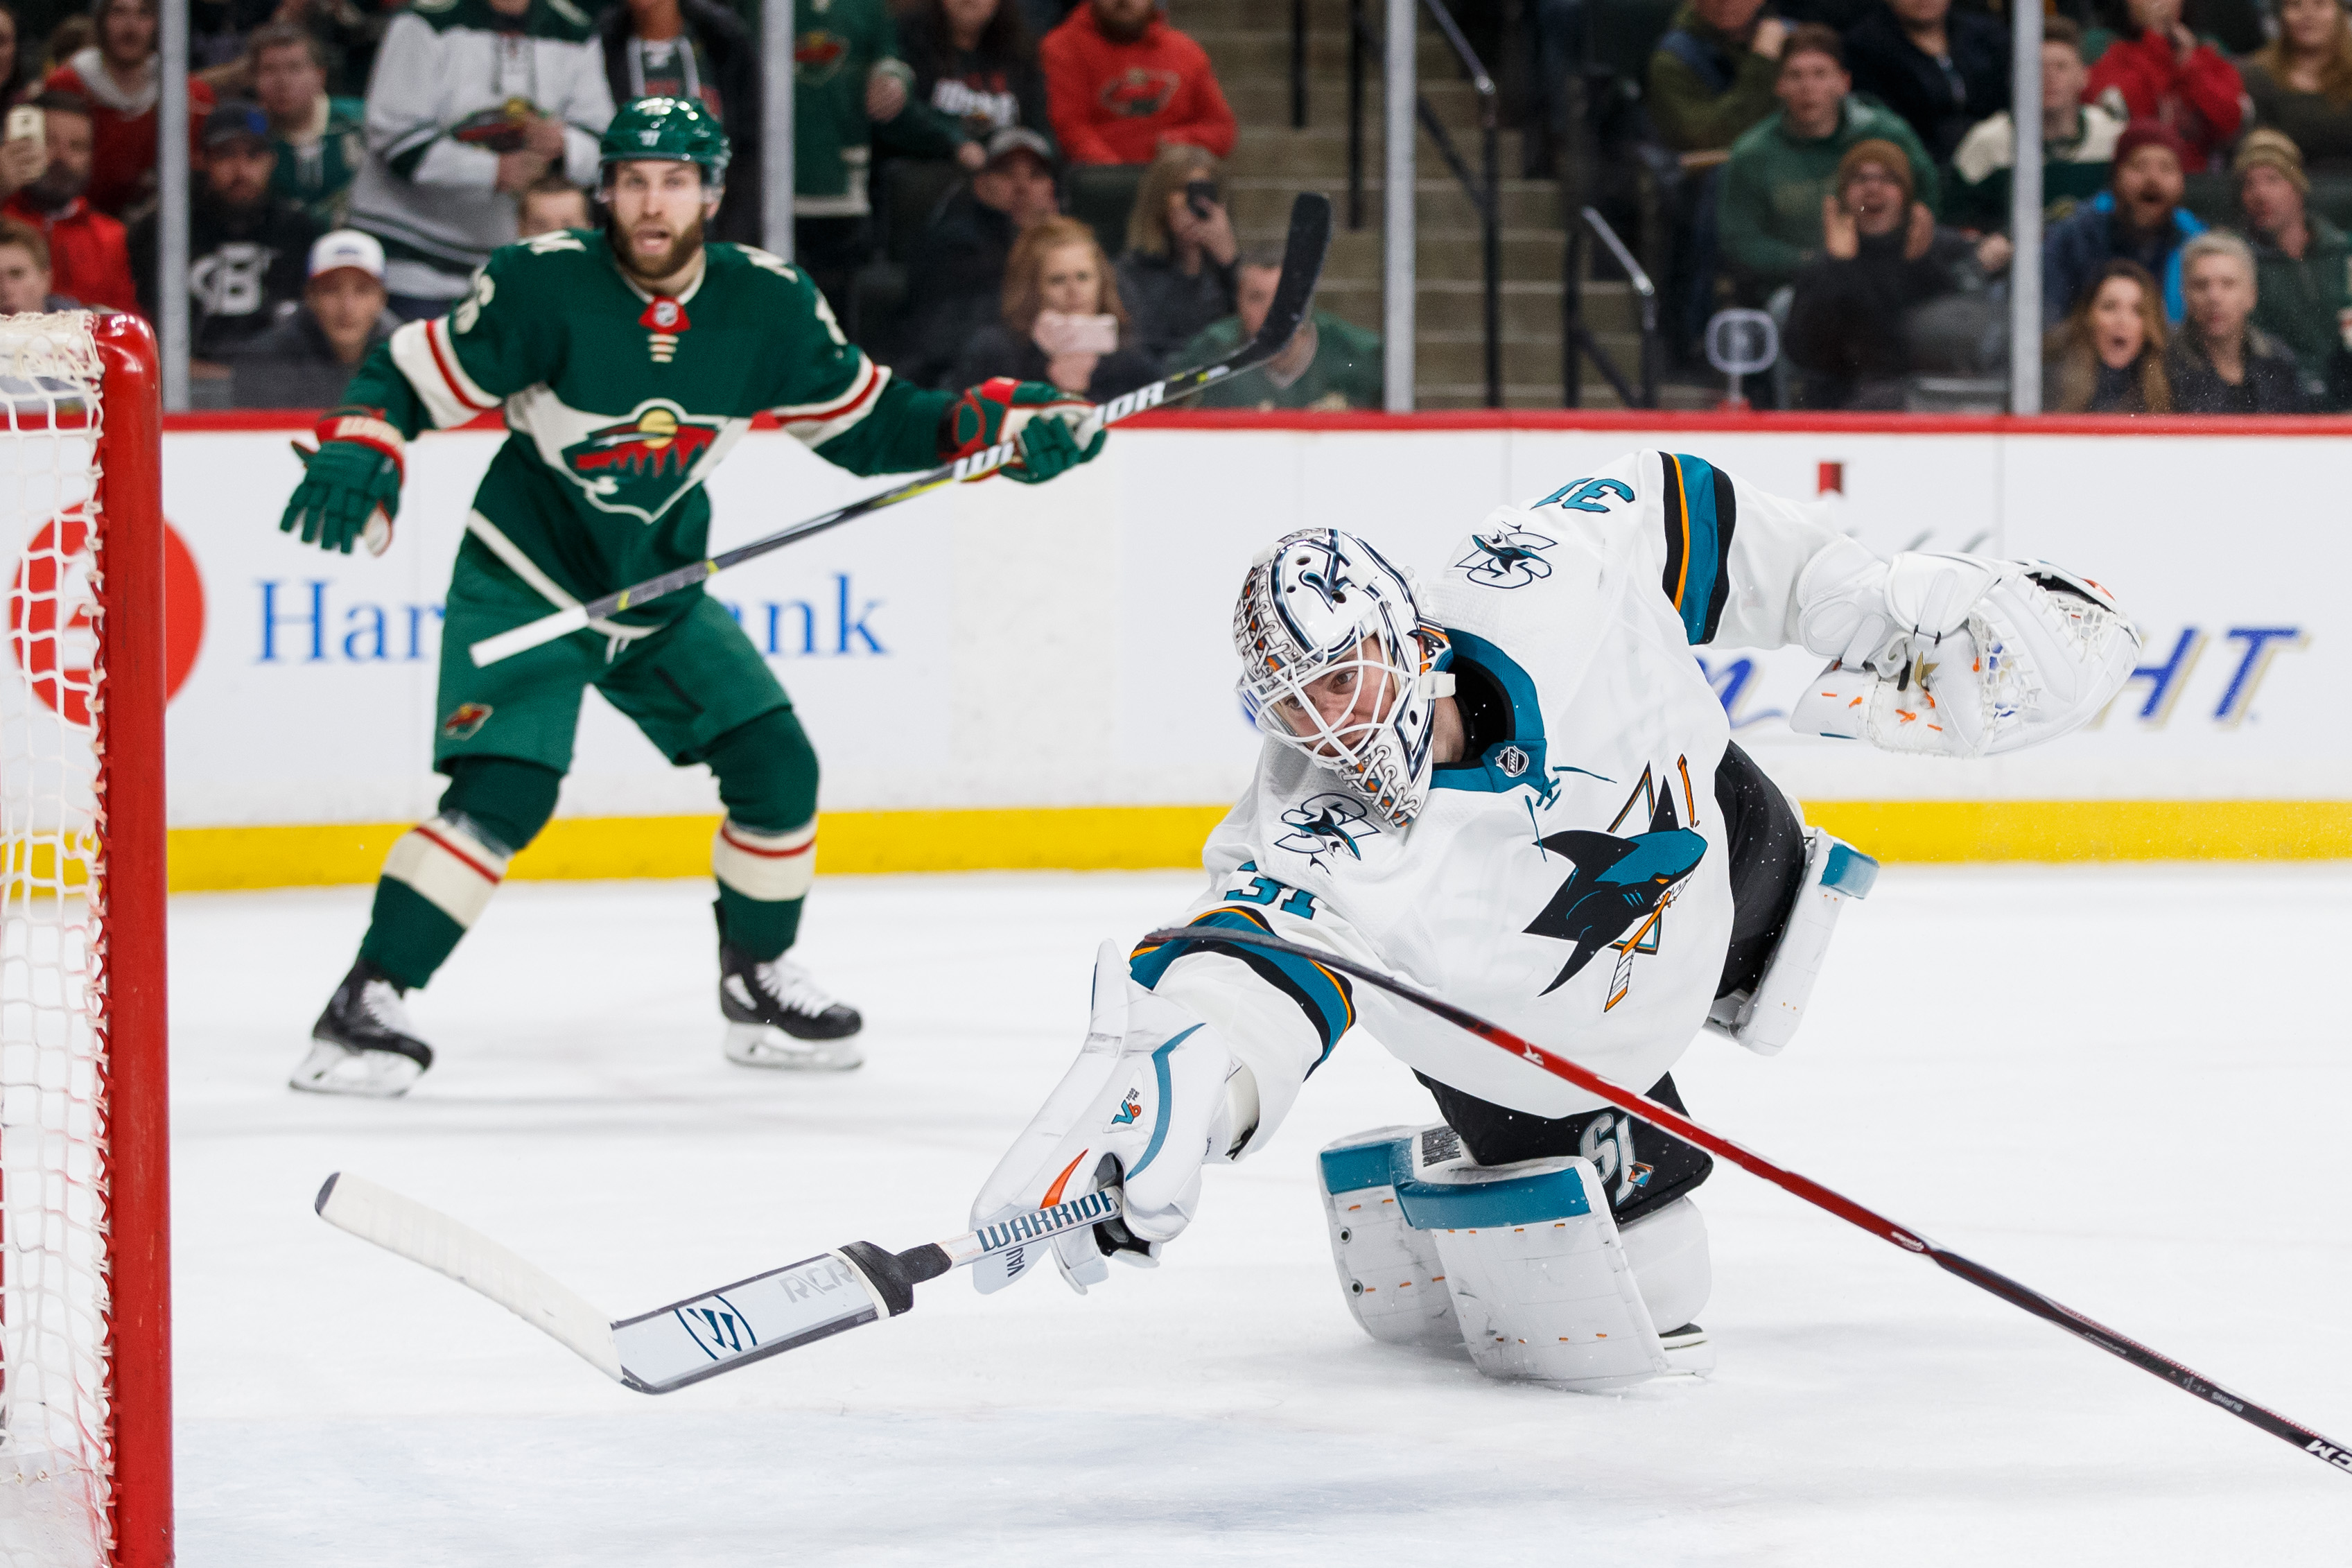 Feb 25, 2018; Saint Paul, MN, USA; San Jose Sharks goalie Martin Jones (31) dives to make a save in overtime against the Minnesota Wild defenseman Jared Spurgeon (46) at Xcel Energy Center.